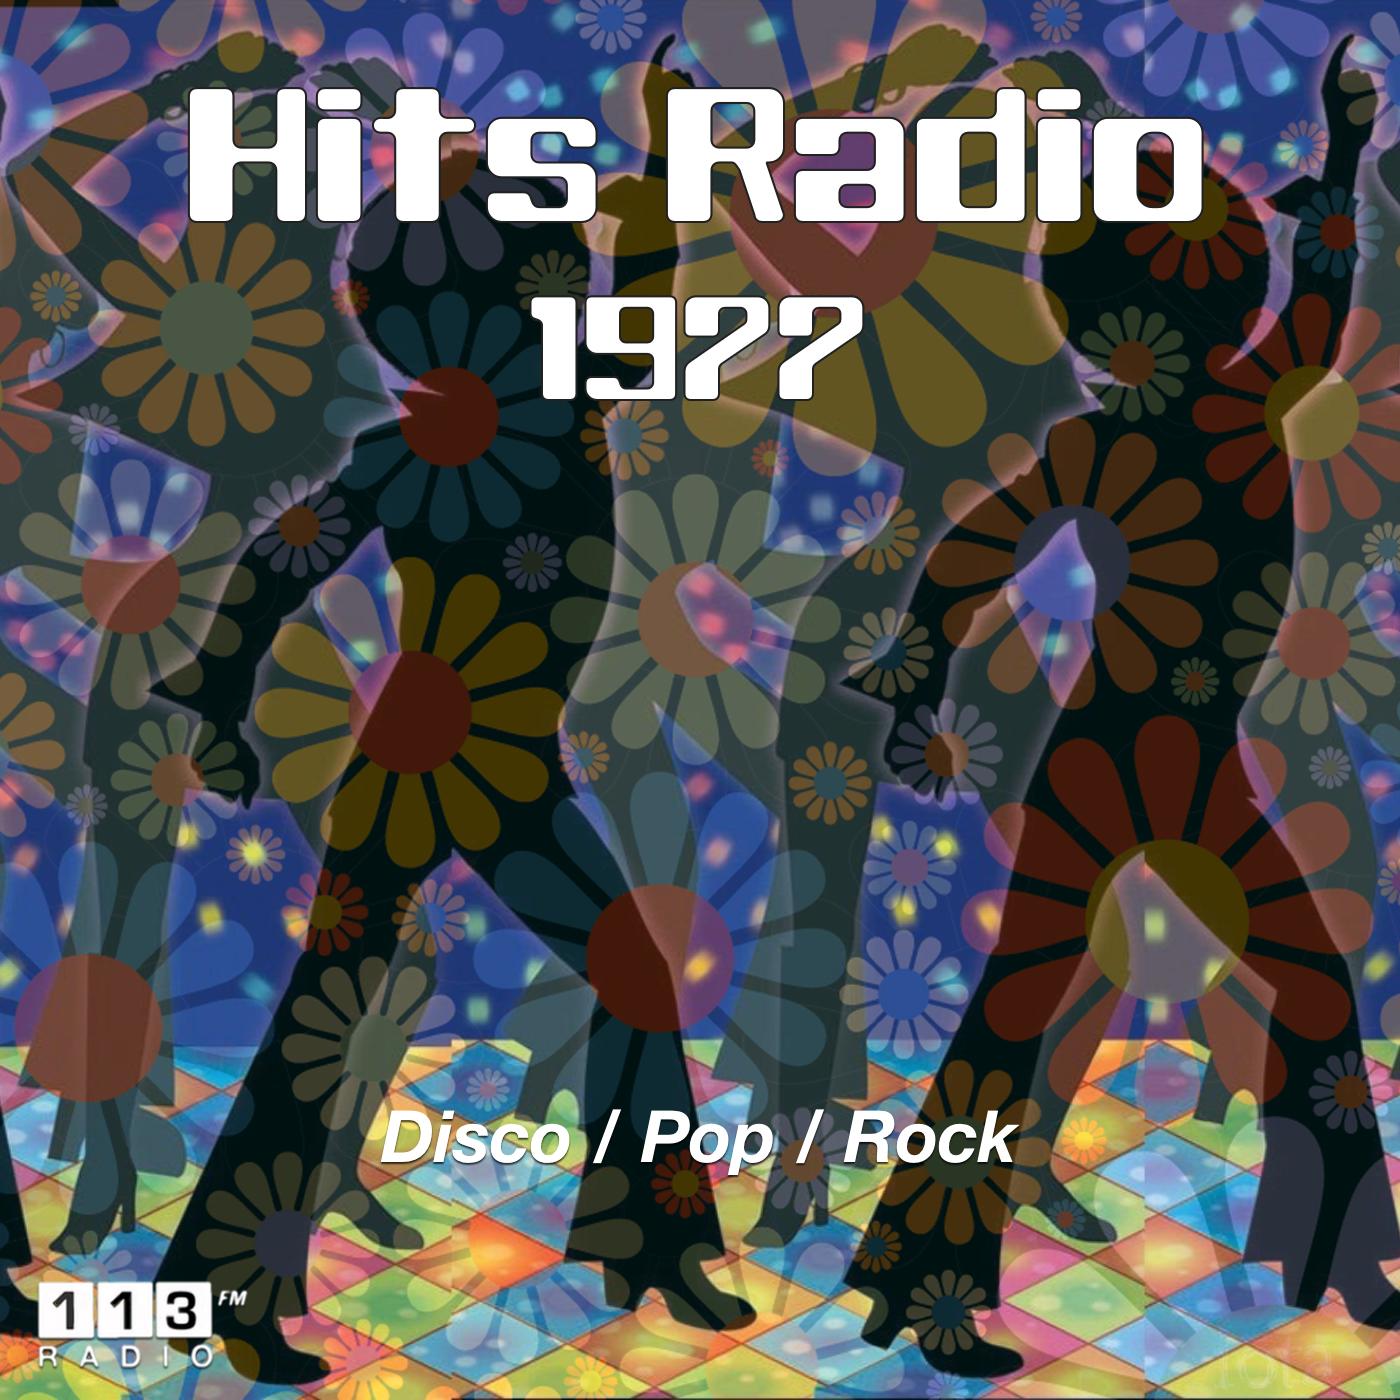 113.fm Hits Radio - 1977